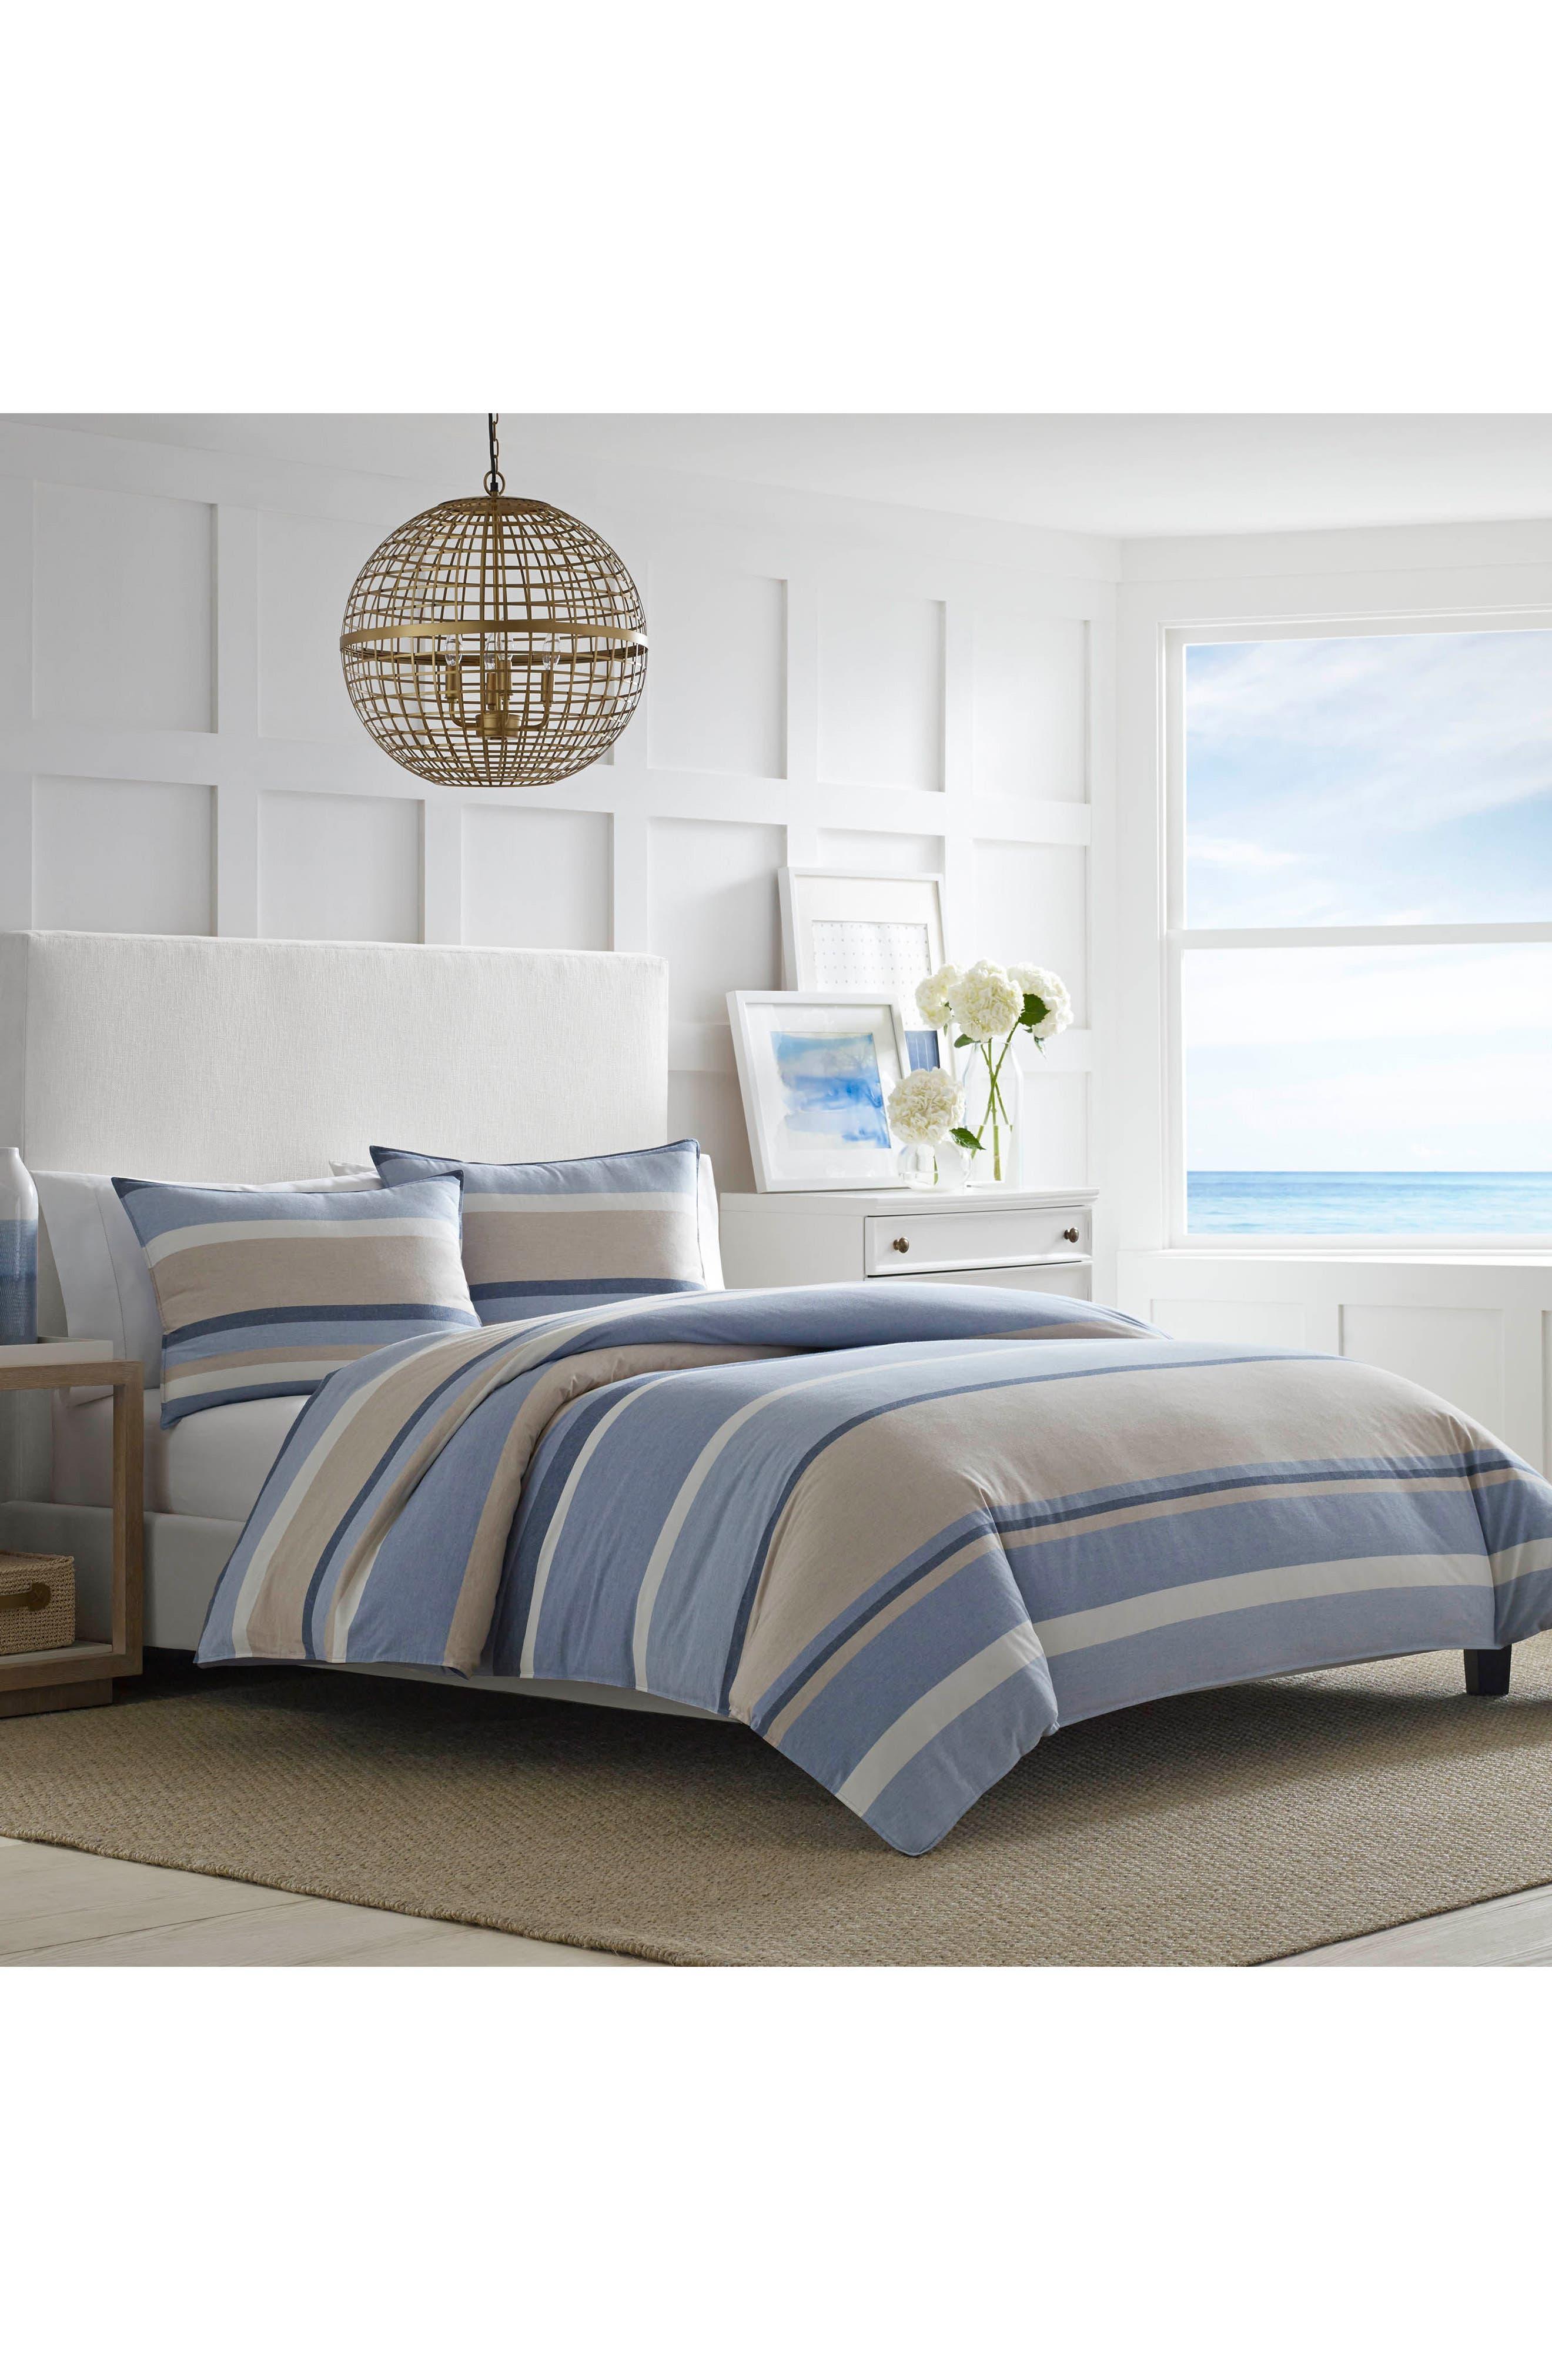 Abbot Comforter & Sham Set,                         Main,                         color, 400